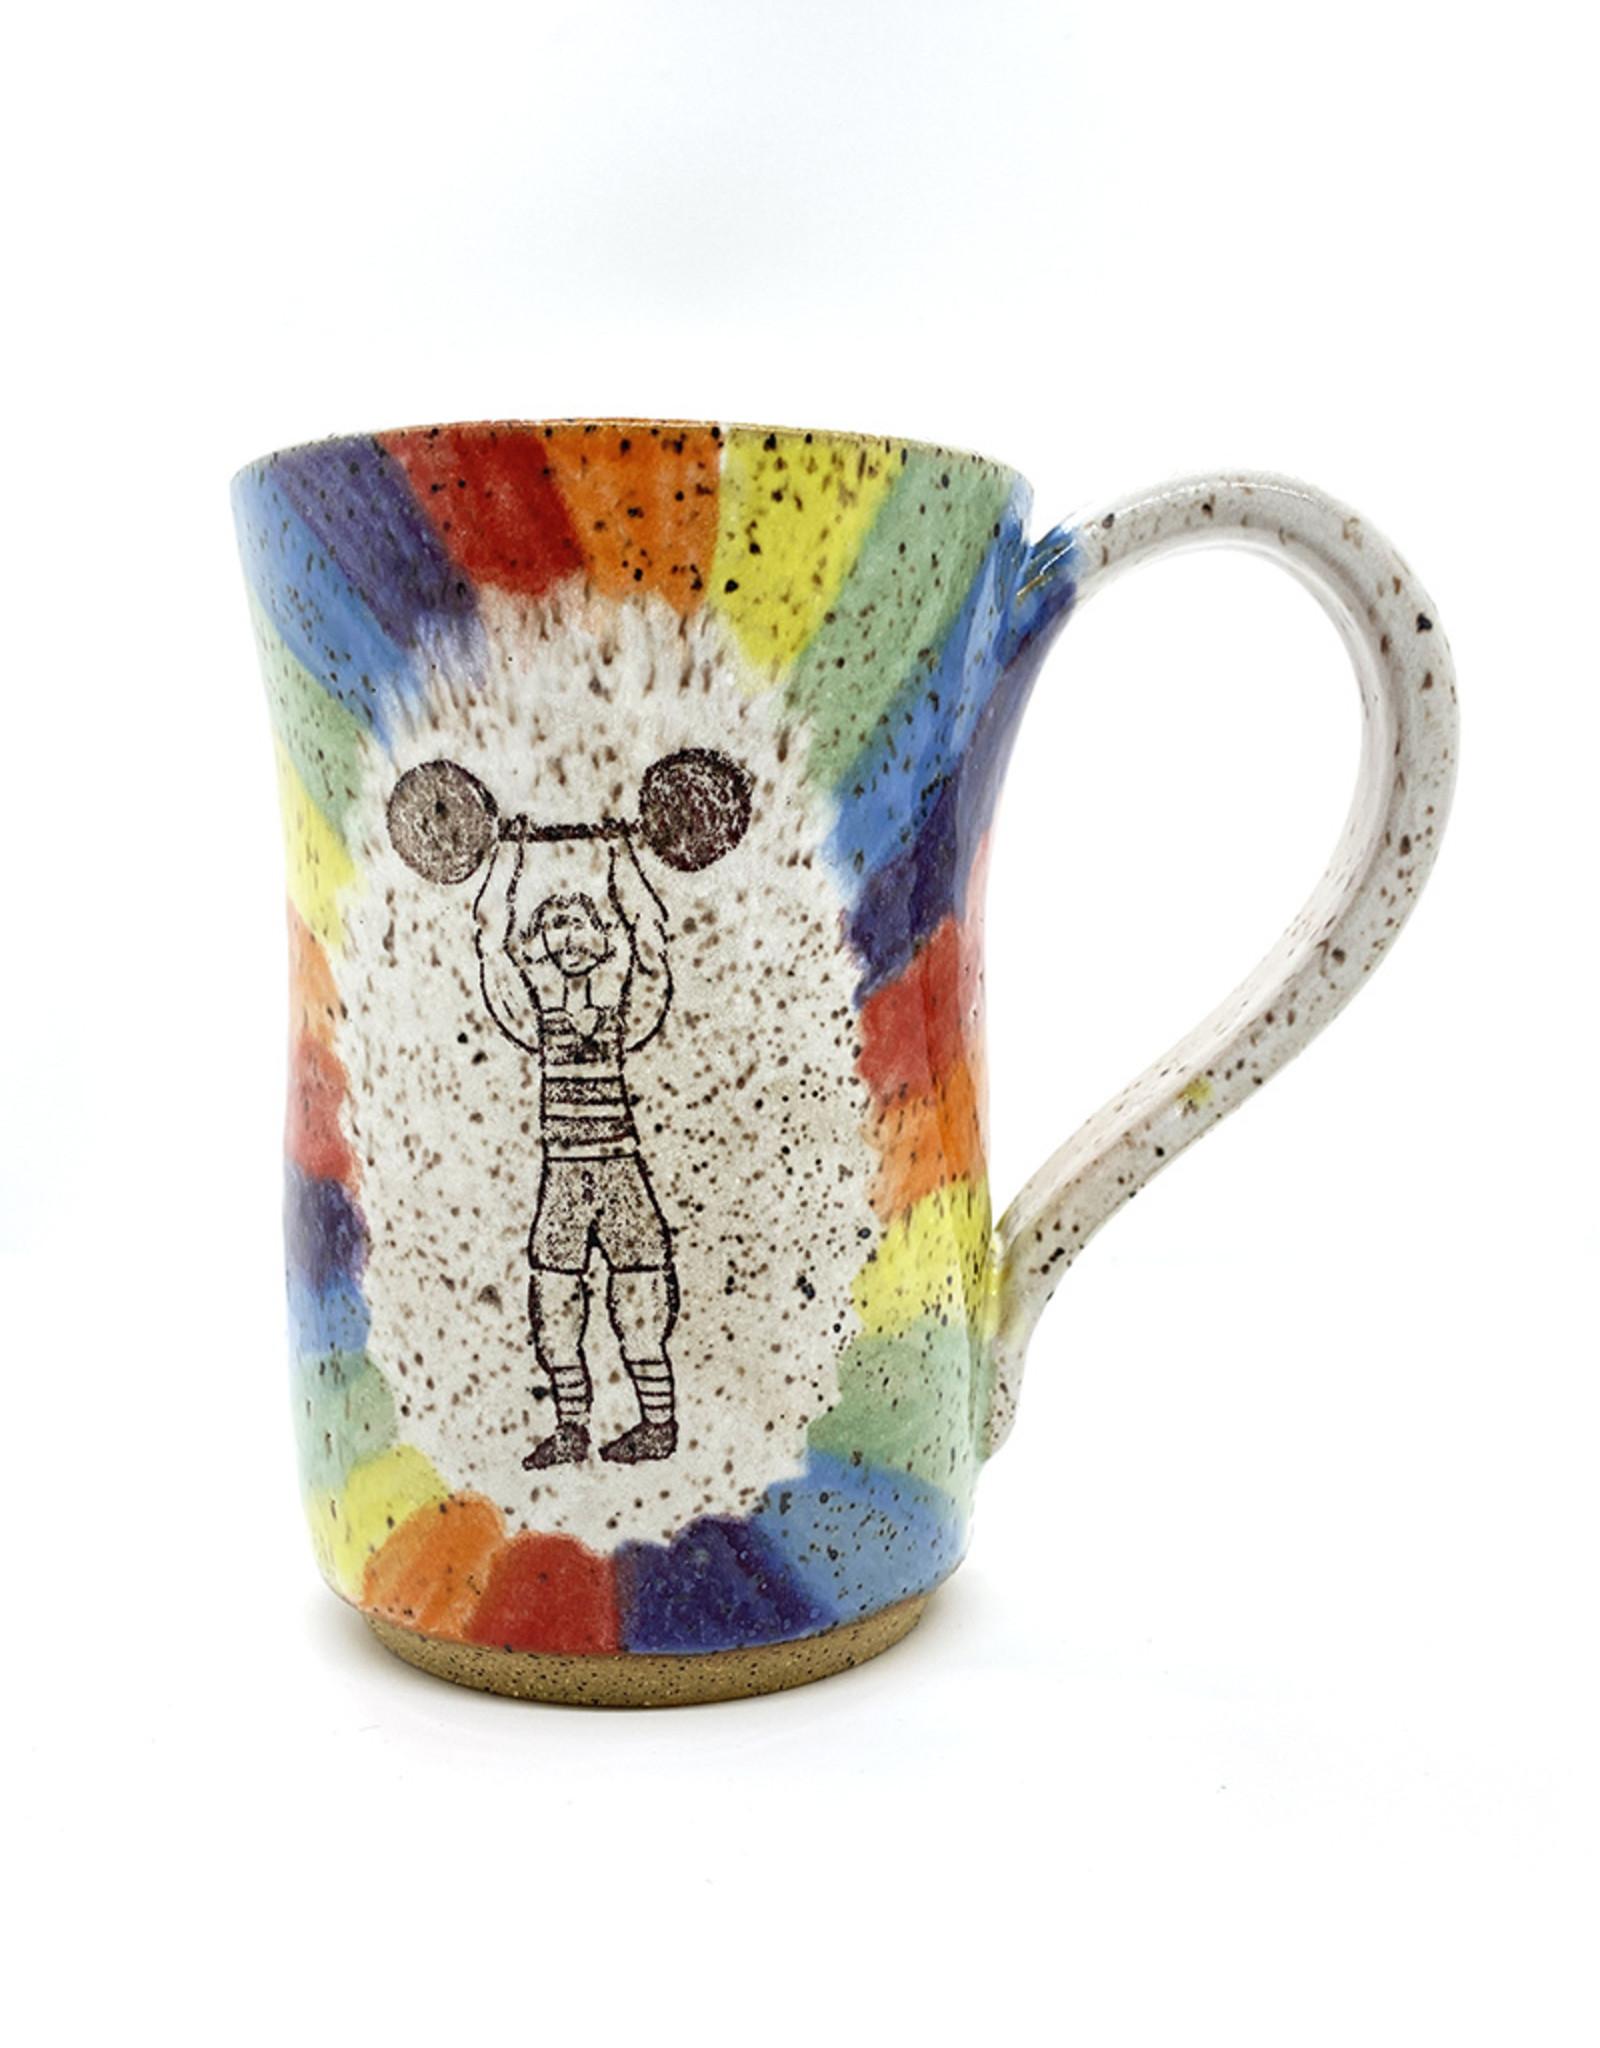 Melanie Harvey Pottery Stoneware Mugs by Melanie Harvey Pottery